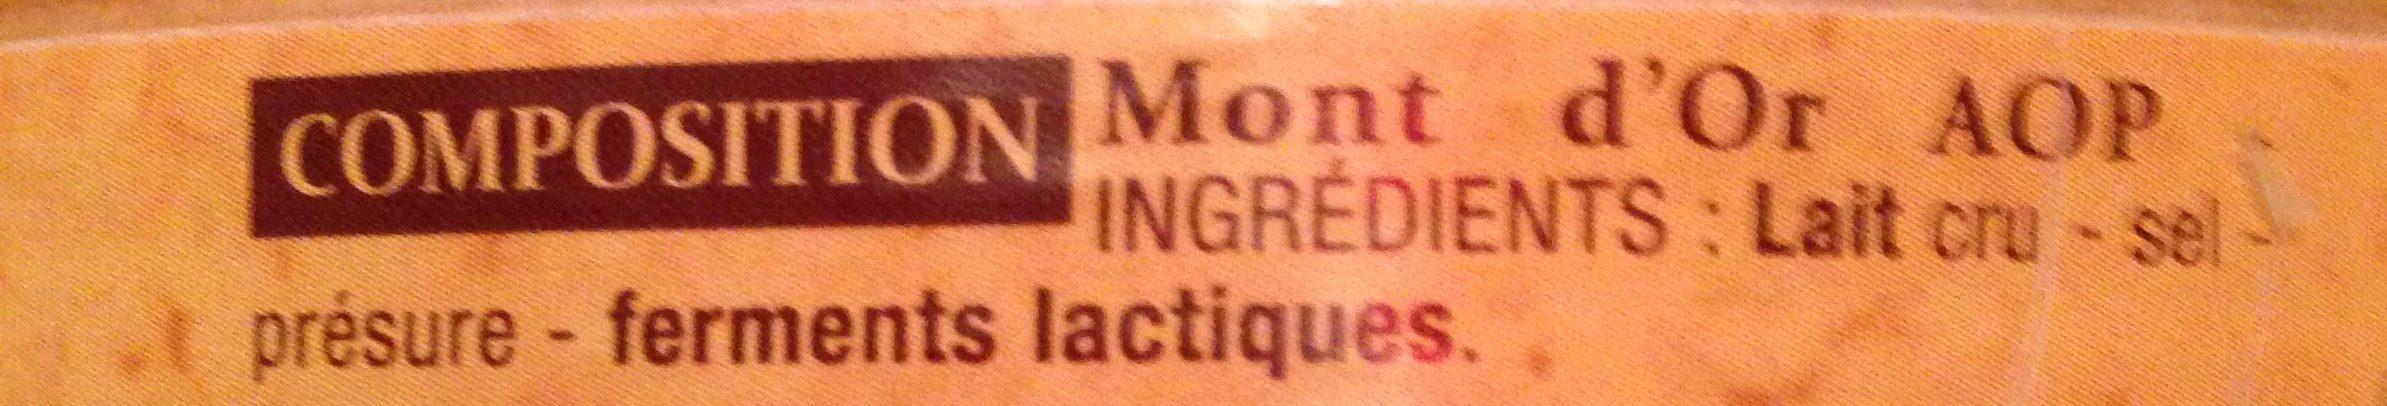 Mont d'or - Ingredients